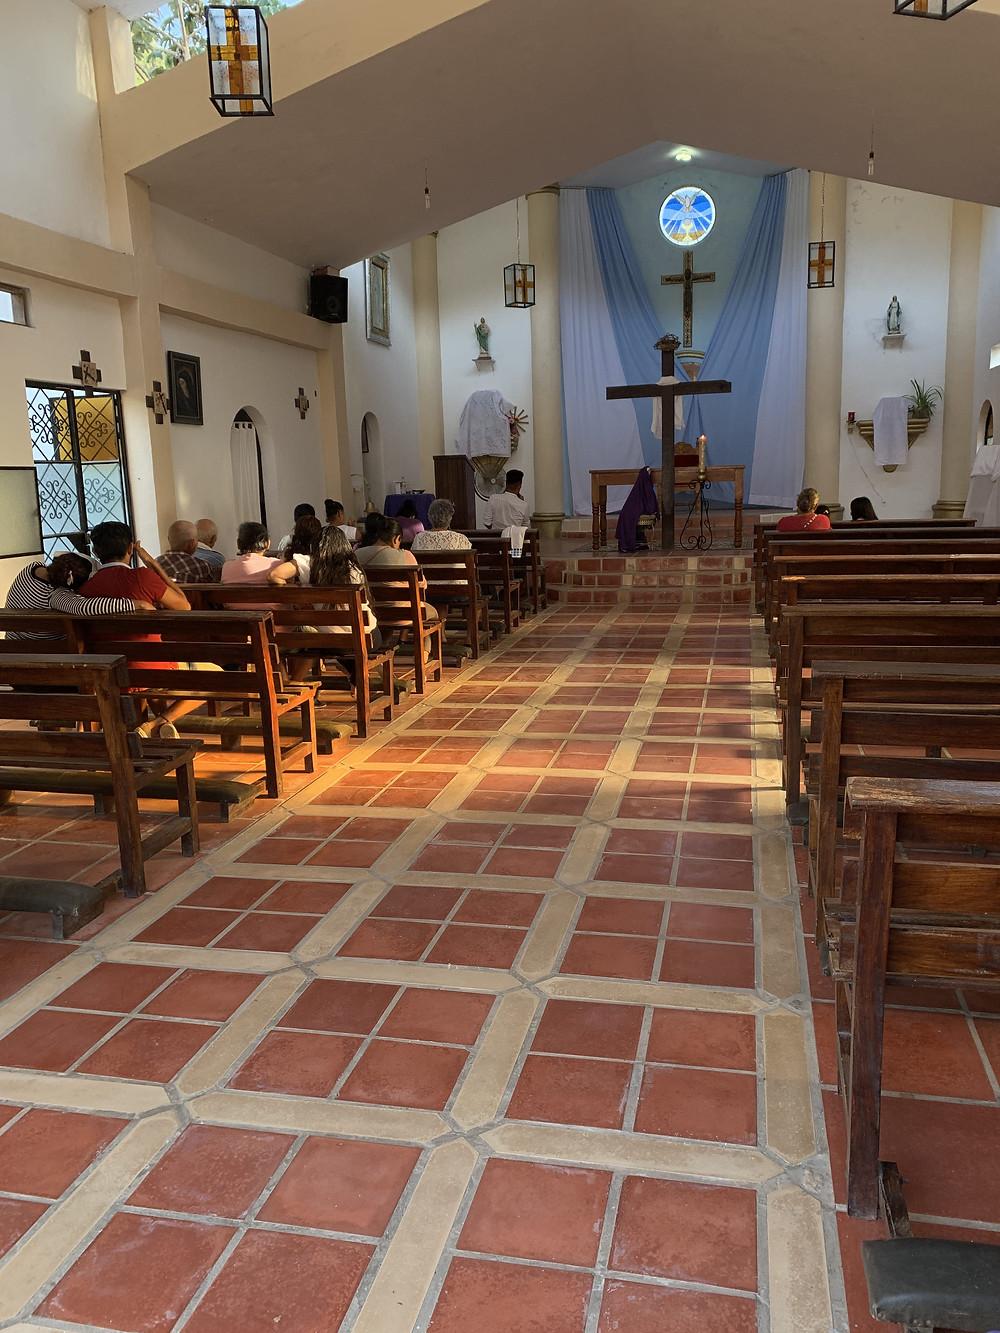 Inside of the chapel.  Waiting for the priest to arrive./ Dentro de la capilla. Esperando a que llegue el sacerdote